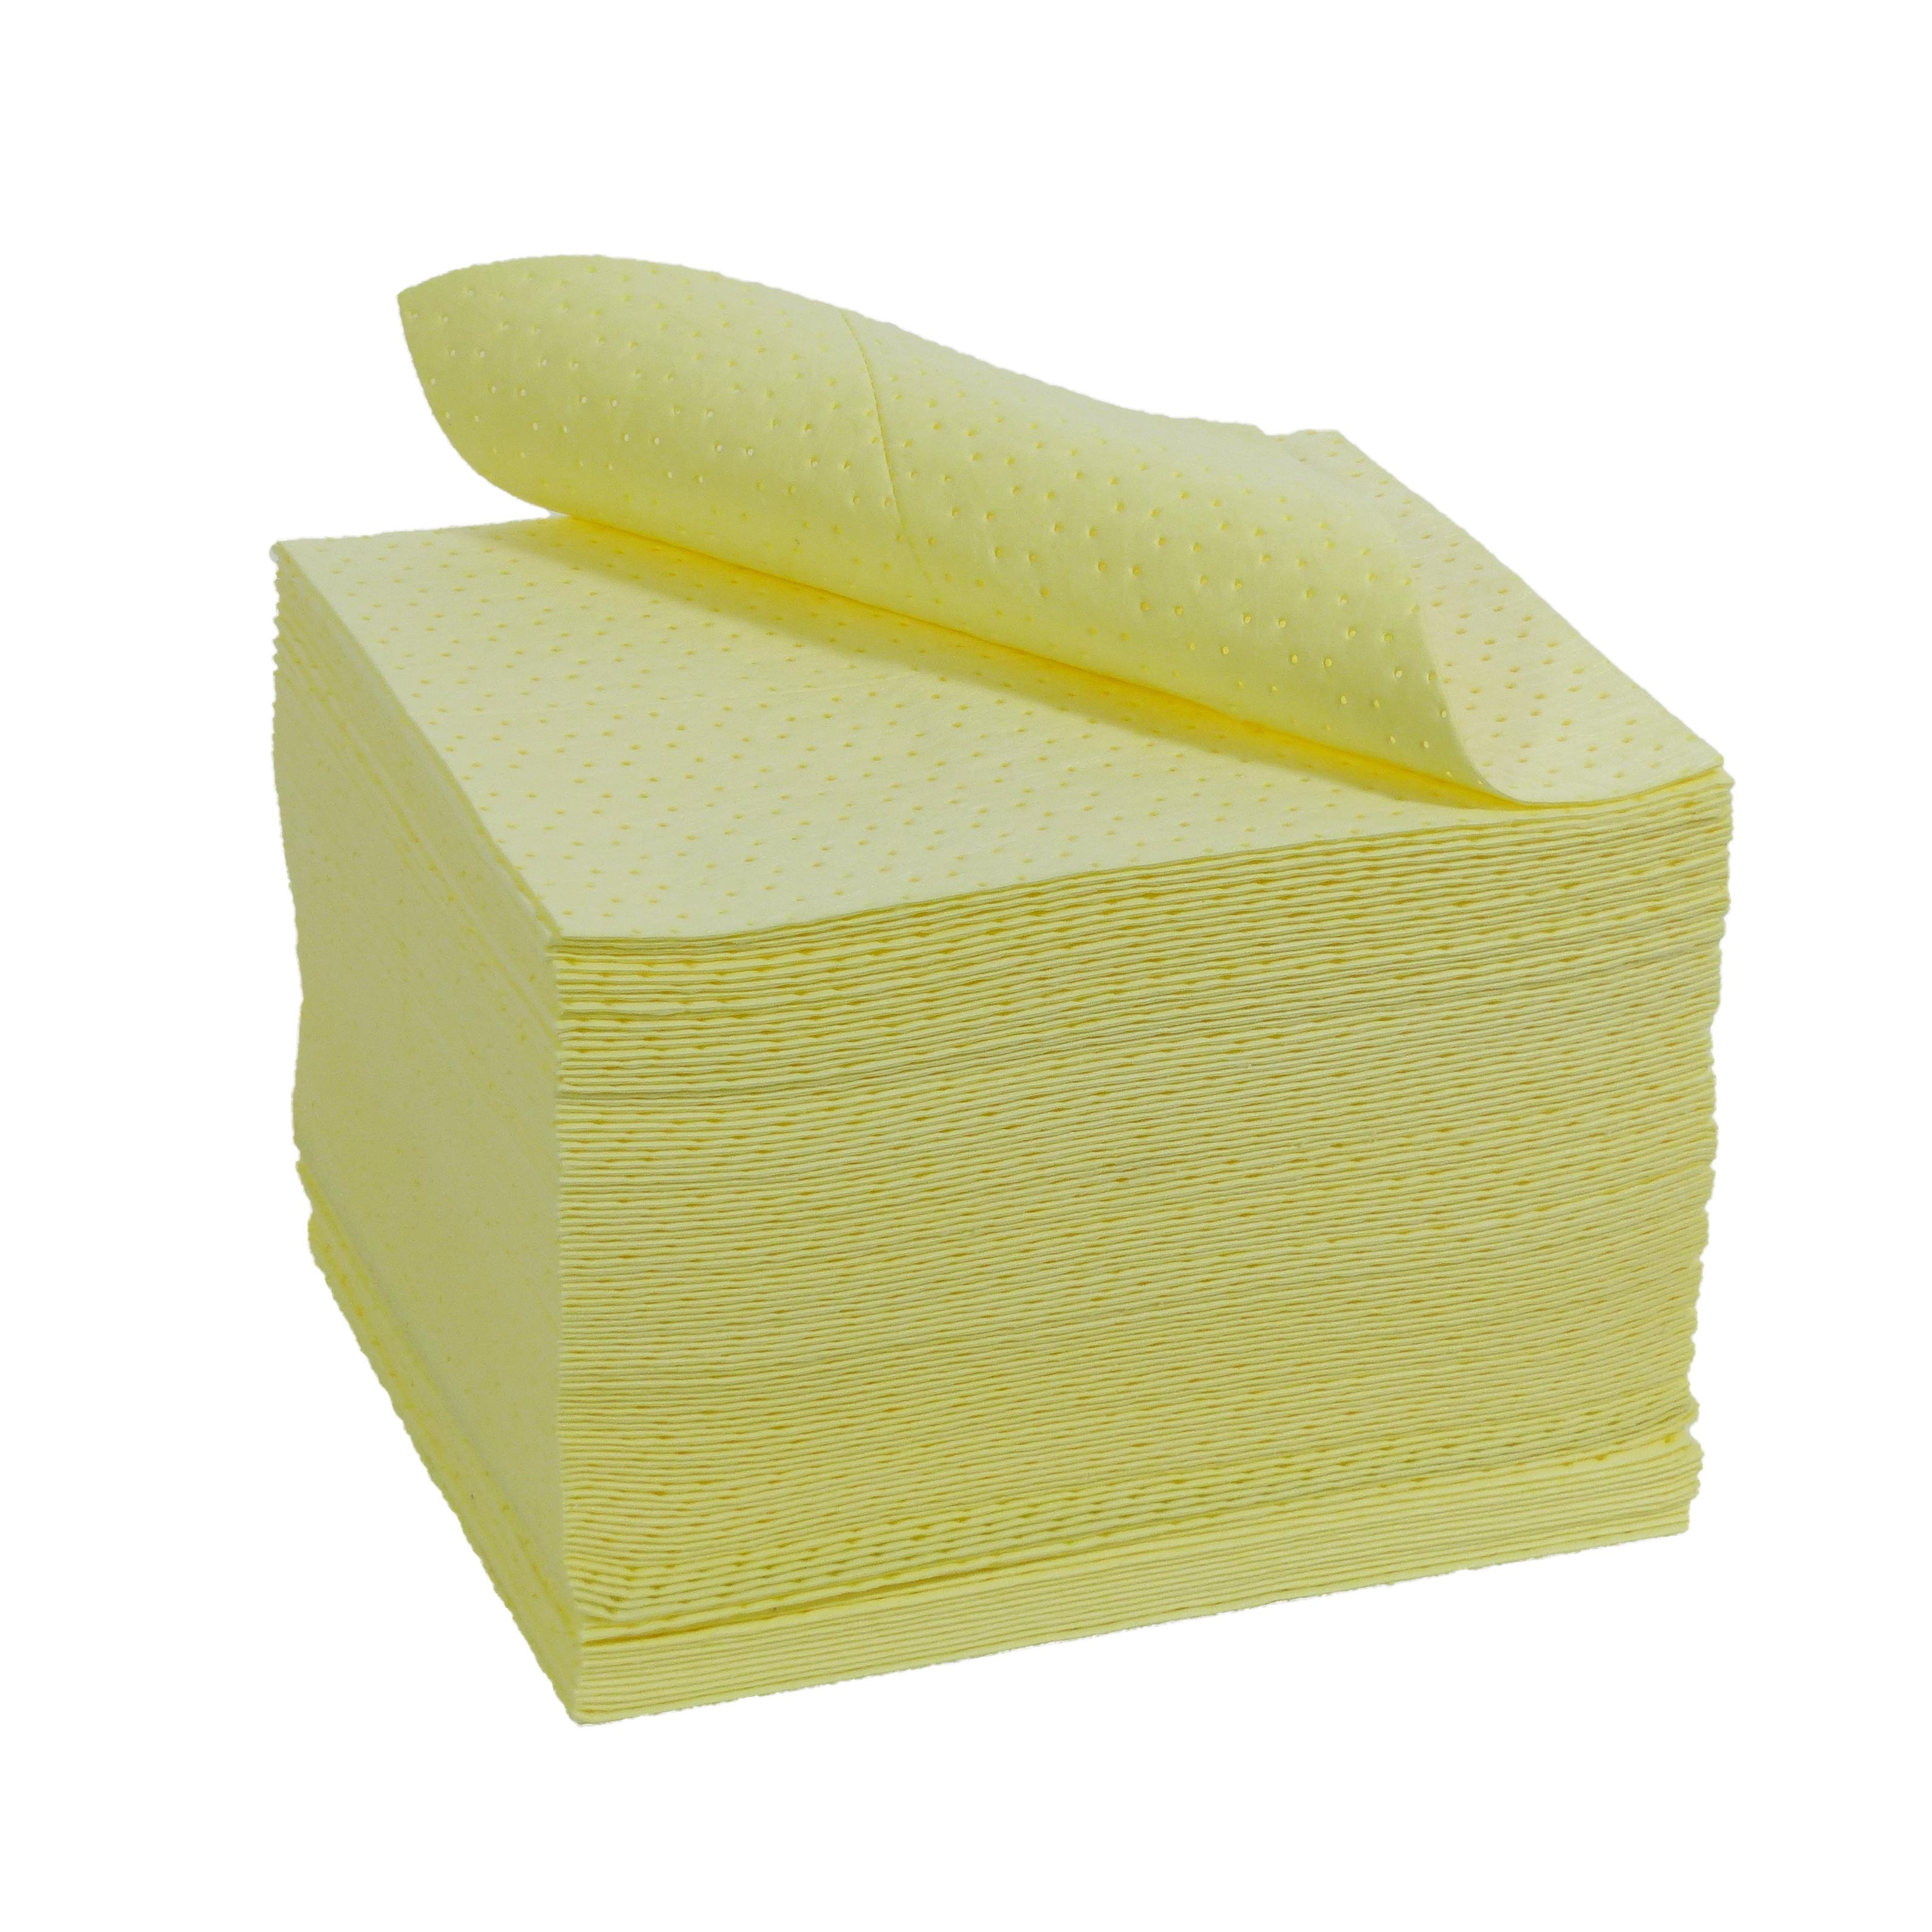 Heavy weight Tücher Bindevlies SM gelb